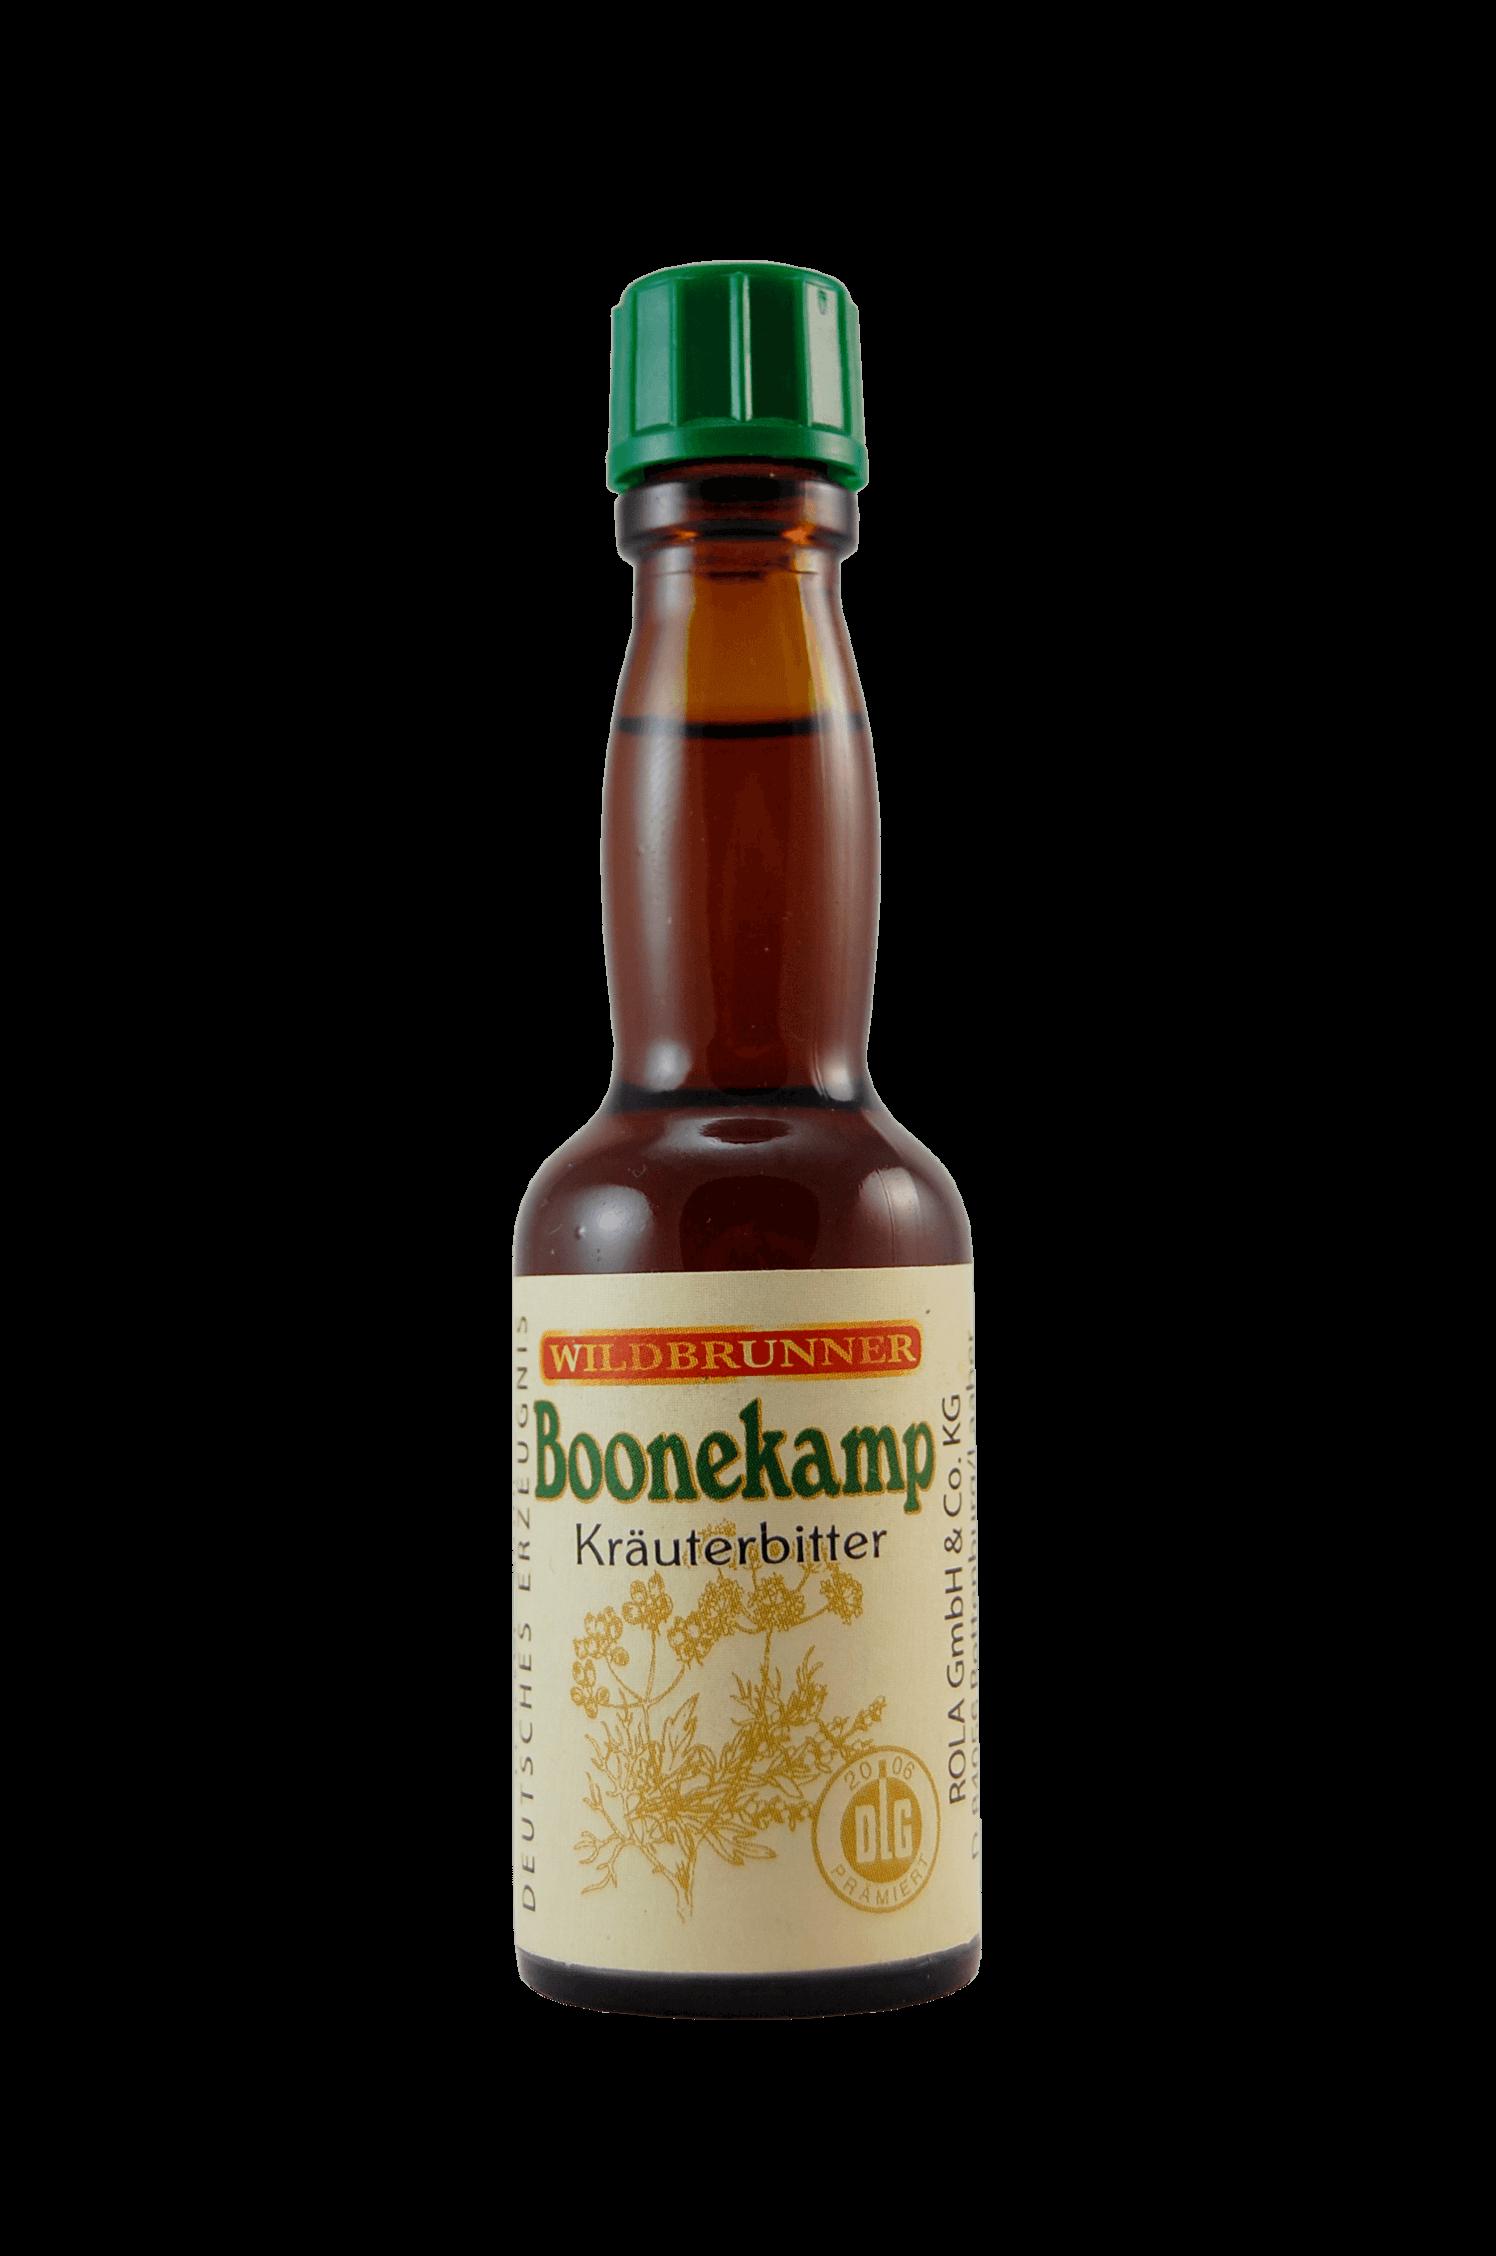 Boonekamp Wildbrunner